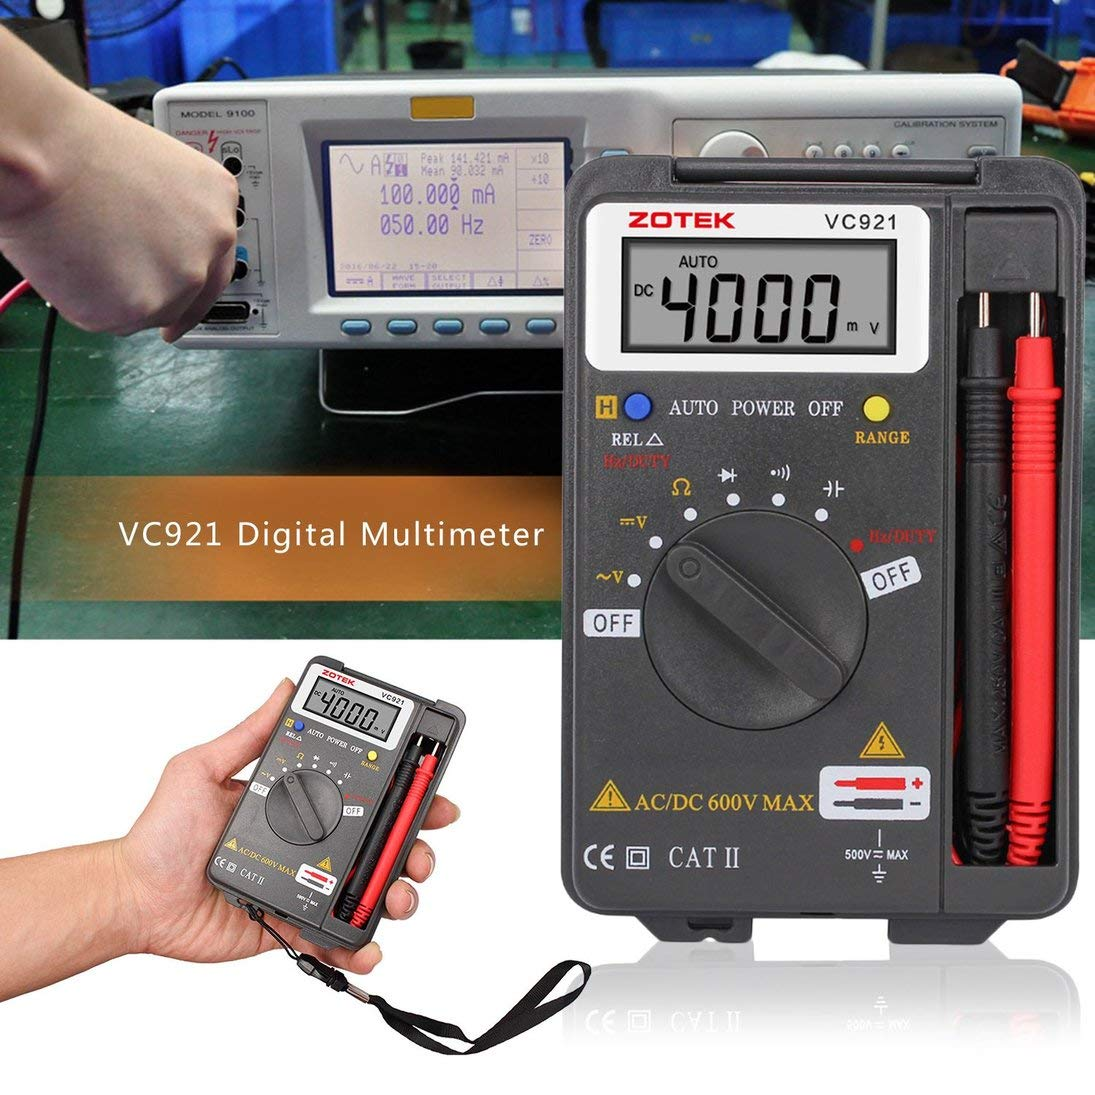 ZOTEK VC921 Mult/ímetro de Autorangaje Digital Port/átil Port/átil de 4000 Condes AC DC Volt/ímetro Ohmios Medidor de Capacitancia Mini Mult/ímetro